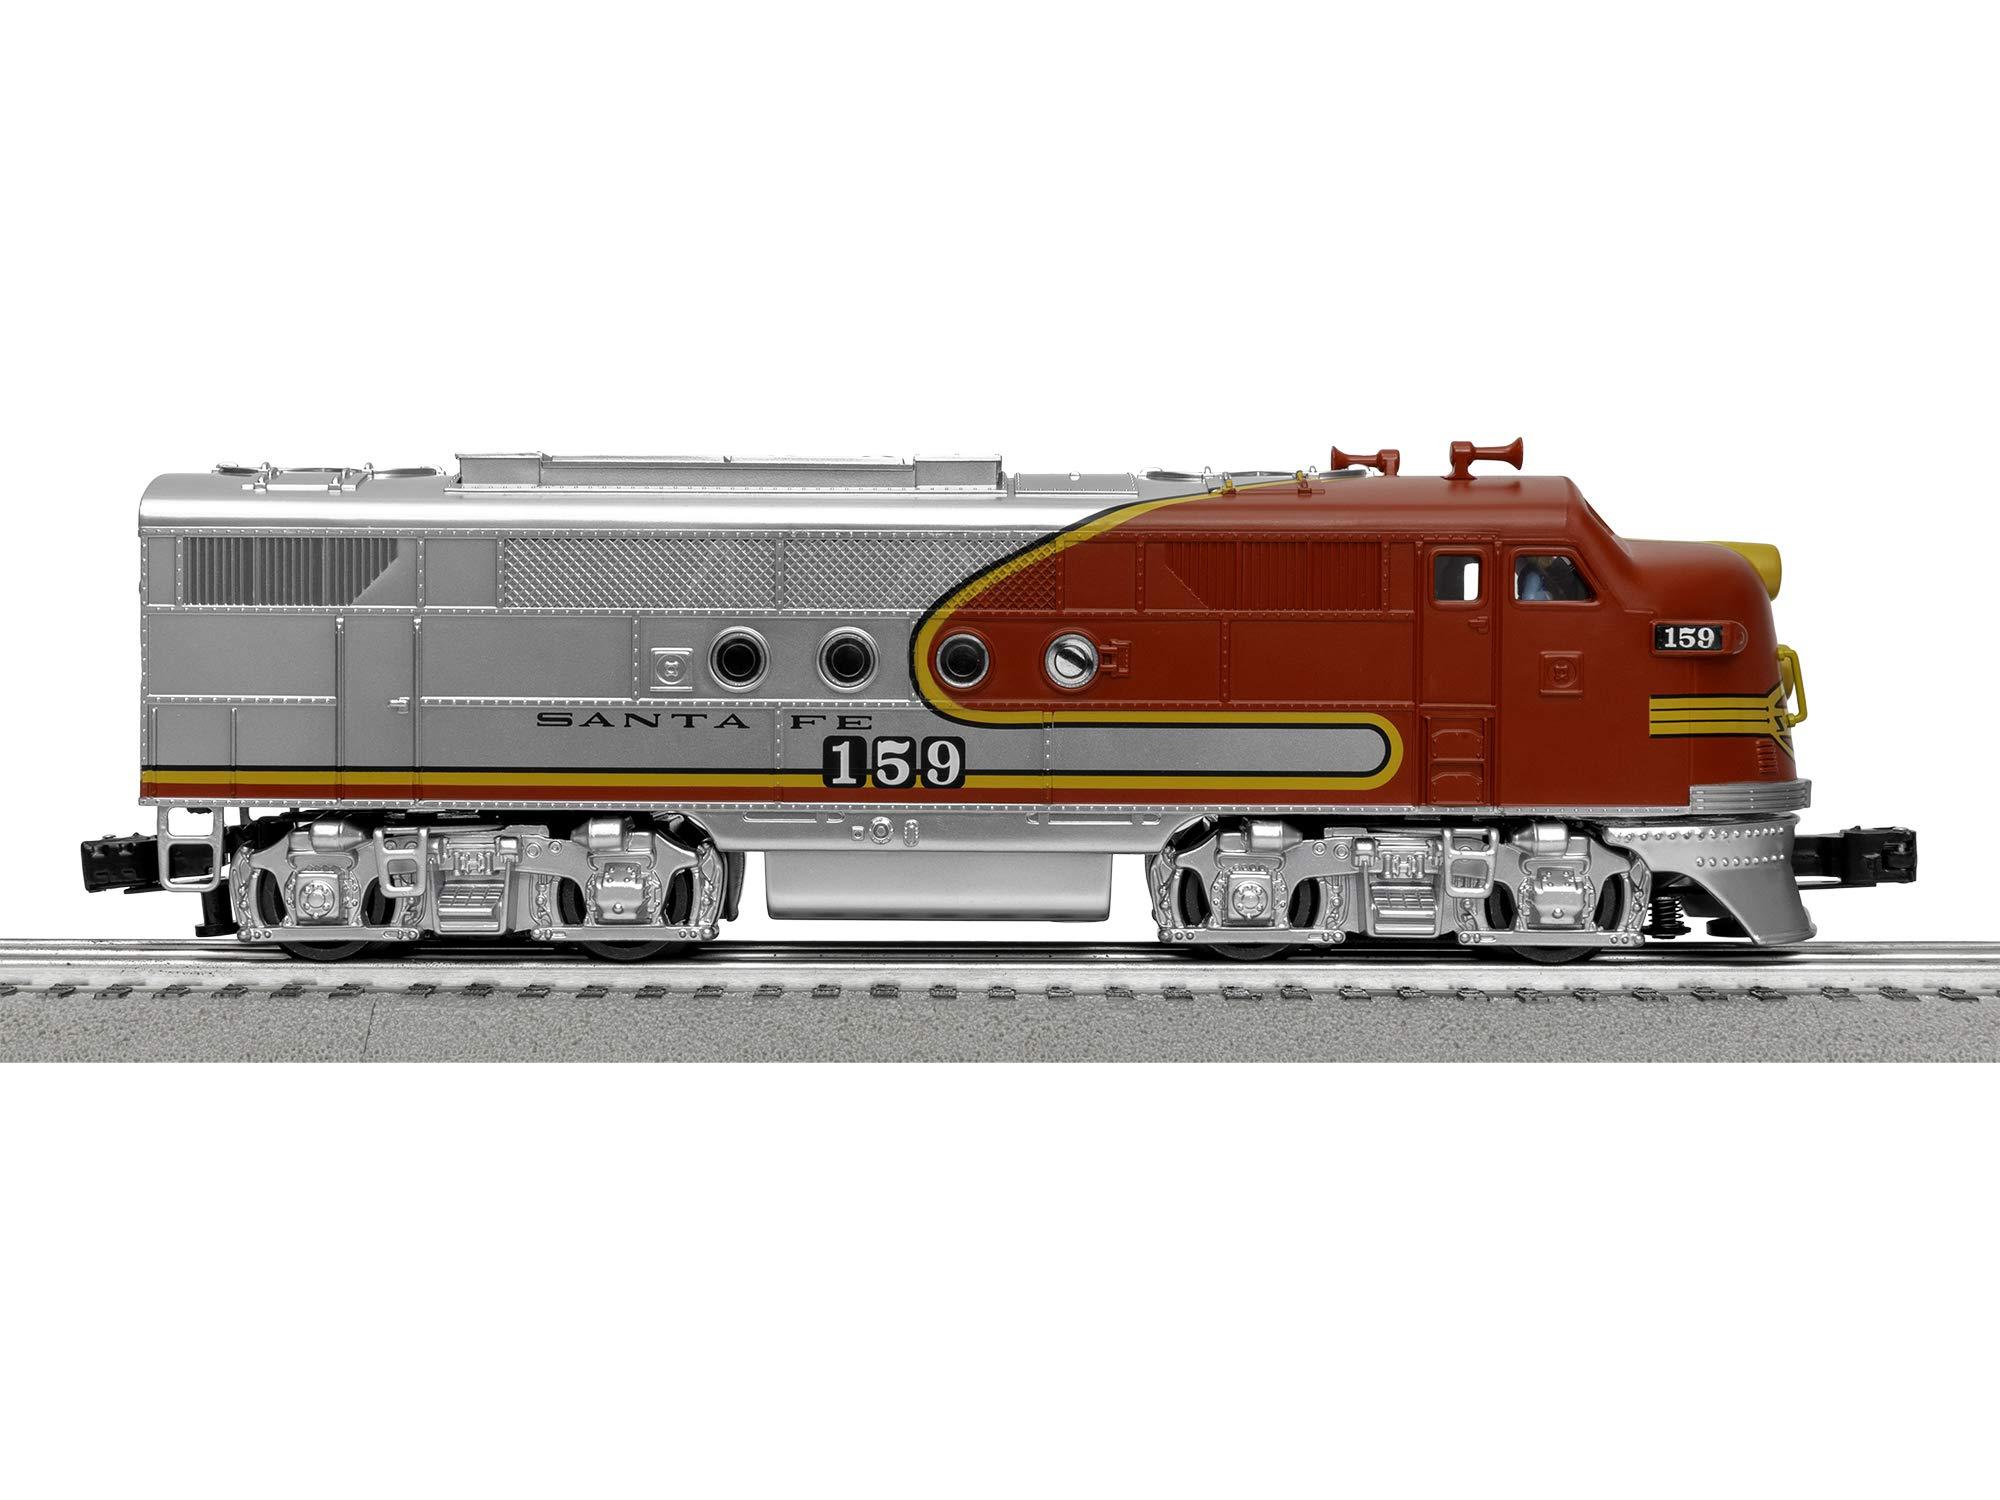 Lionel Santa Fe Super Chief Electric O Gauge Model Train Set w/ Remote and Bluetooth Capability by Lionel (Image #6)